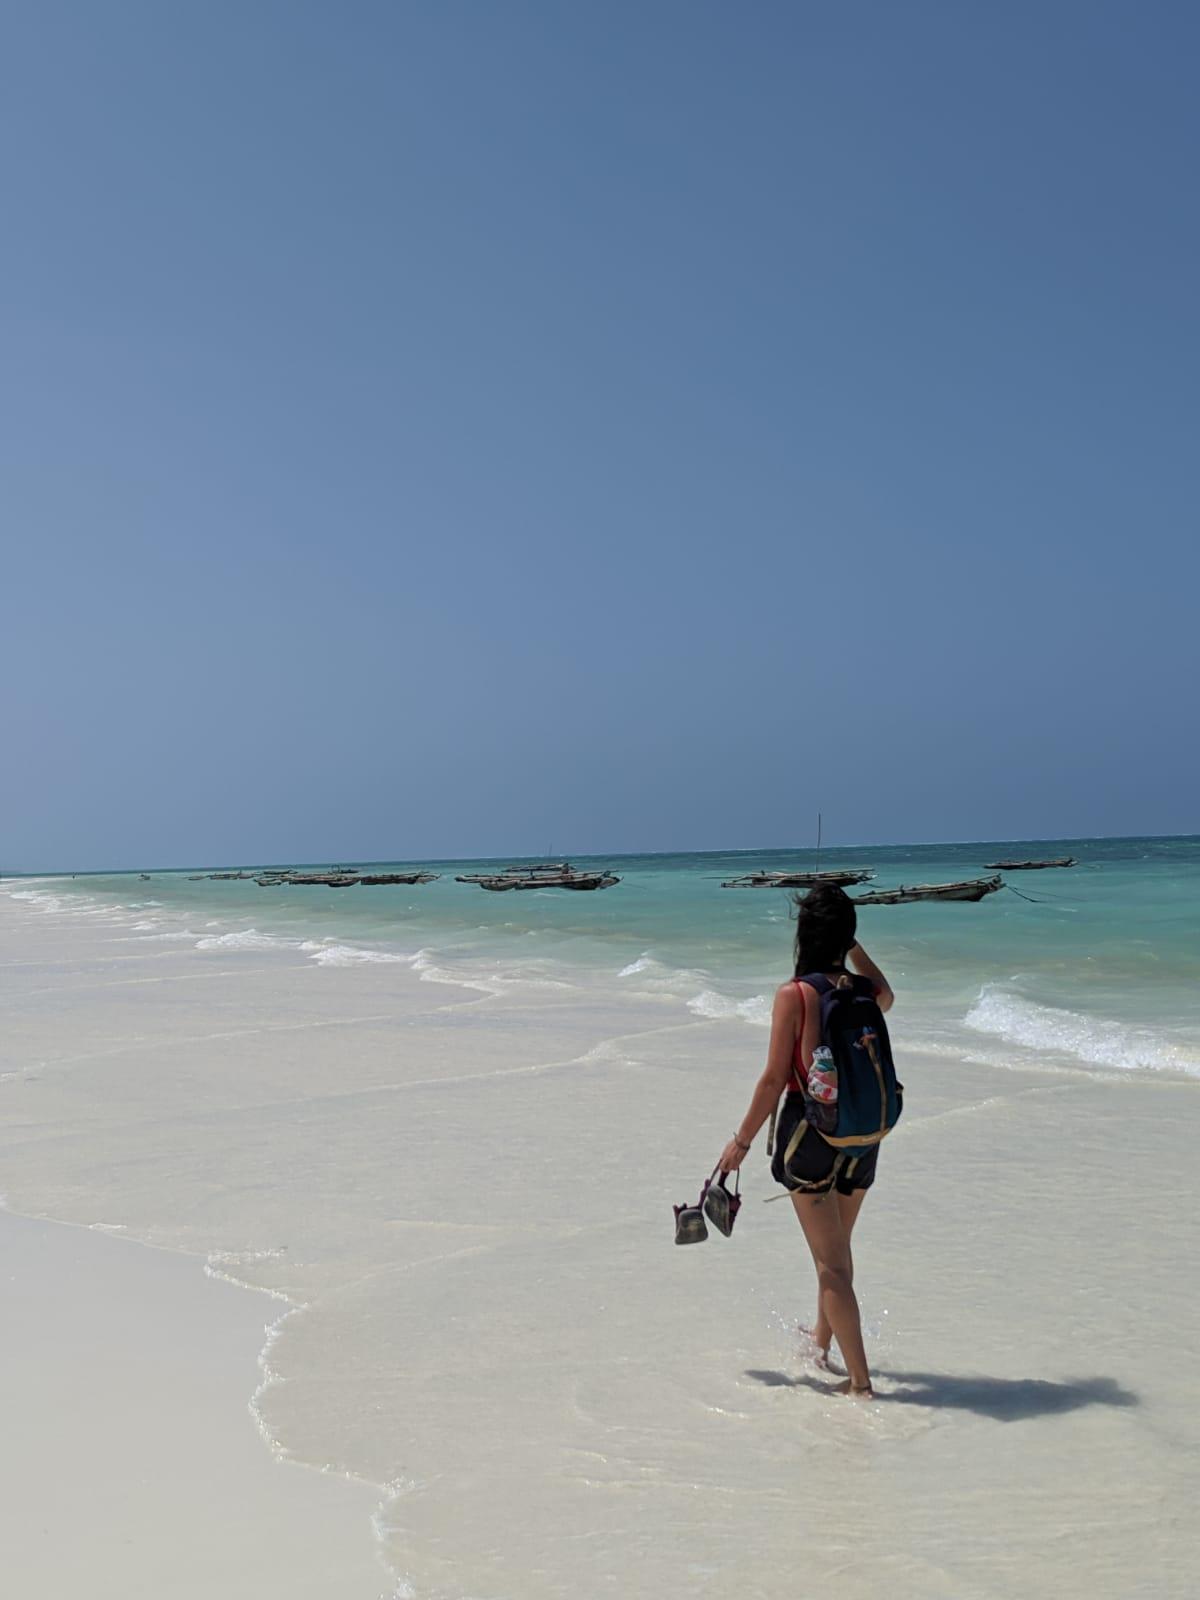 Walking on the white sand in Jambiani Beach, Zanzibar, Tanzania